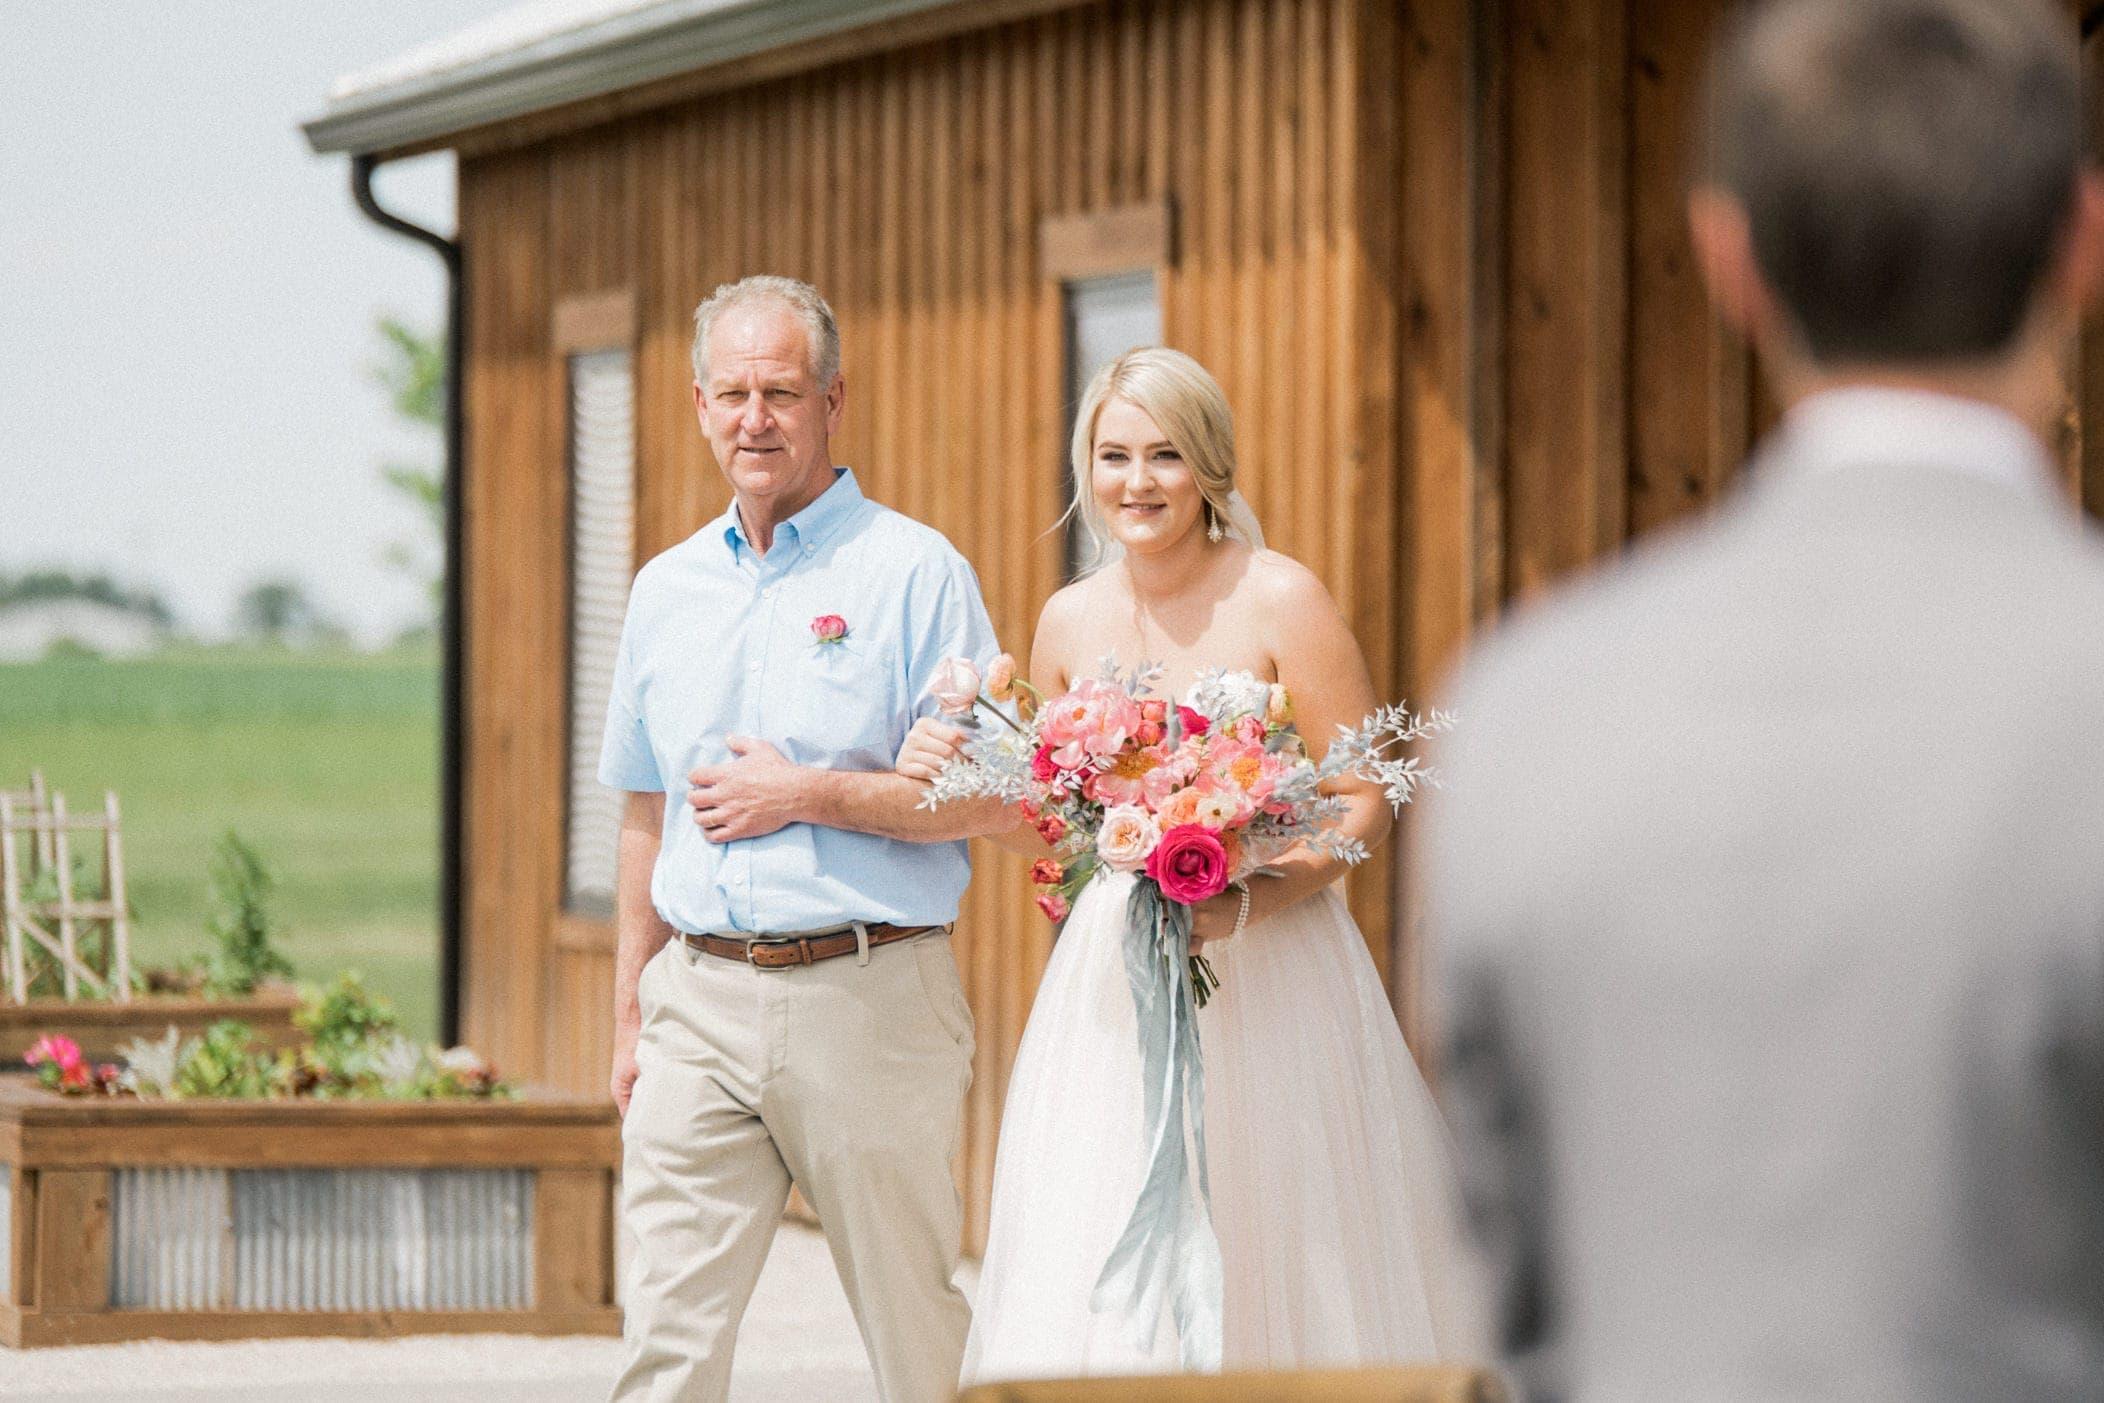 Irishman Acres Clover Barn wedding ceremony